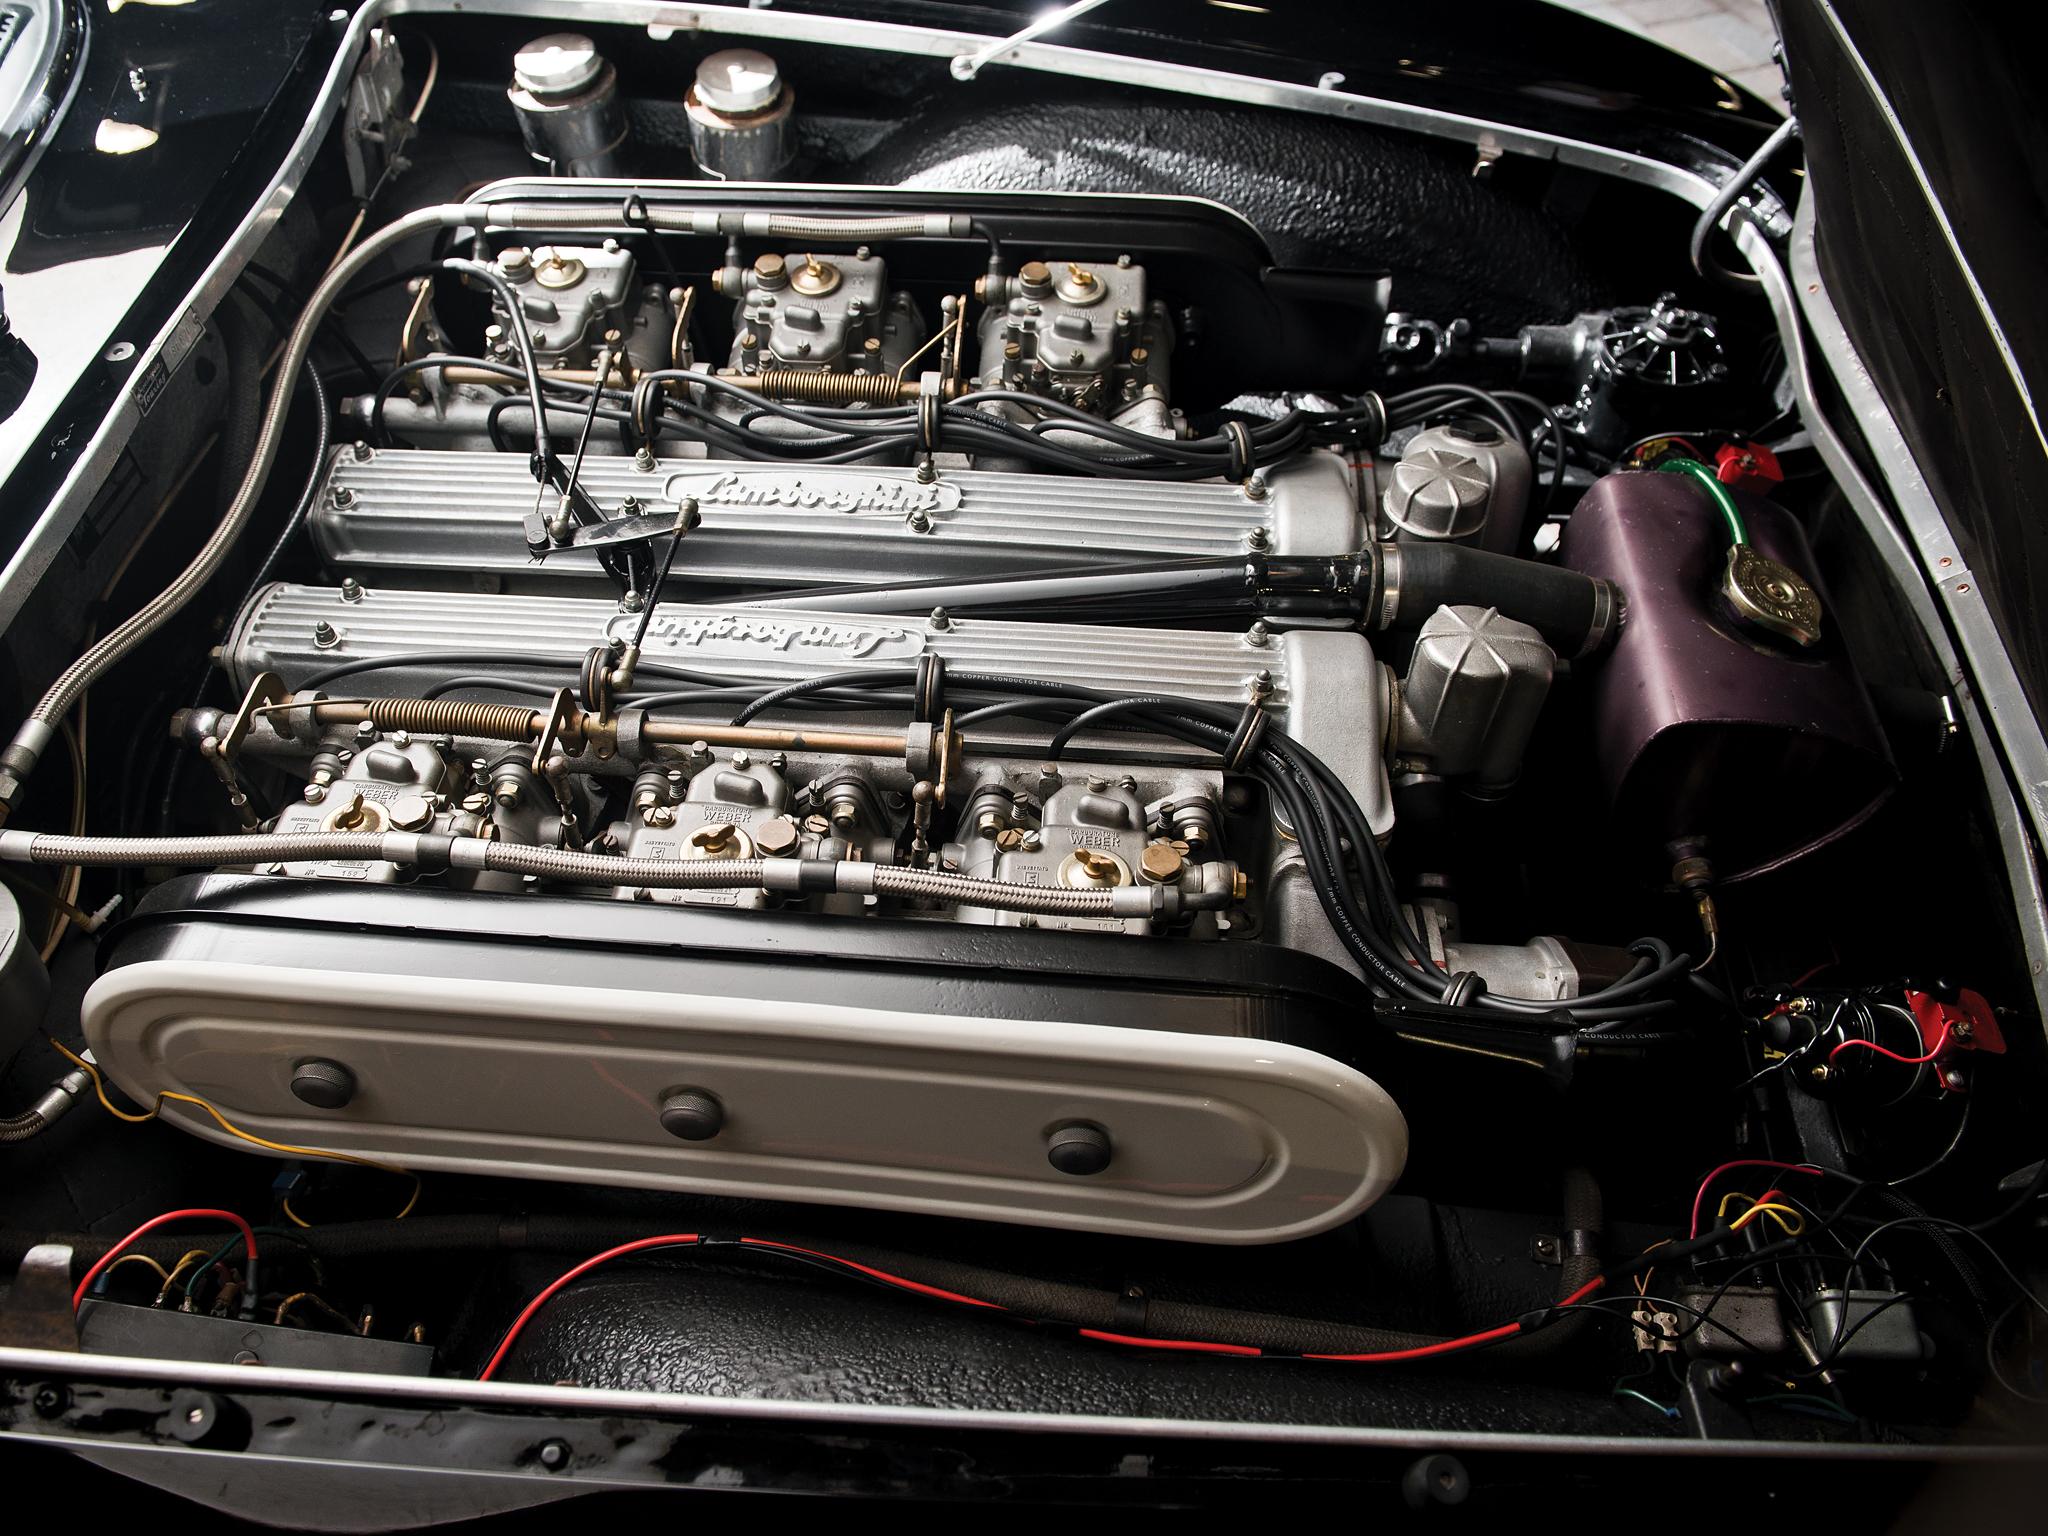 Lamborghini-350_GT_mp28_pic_93551